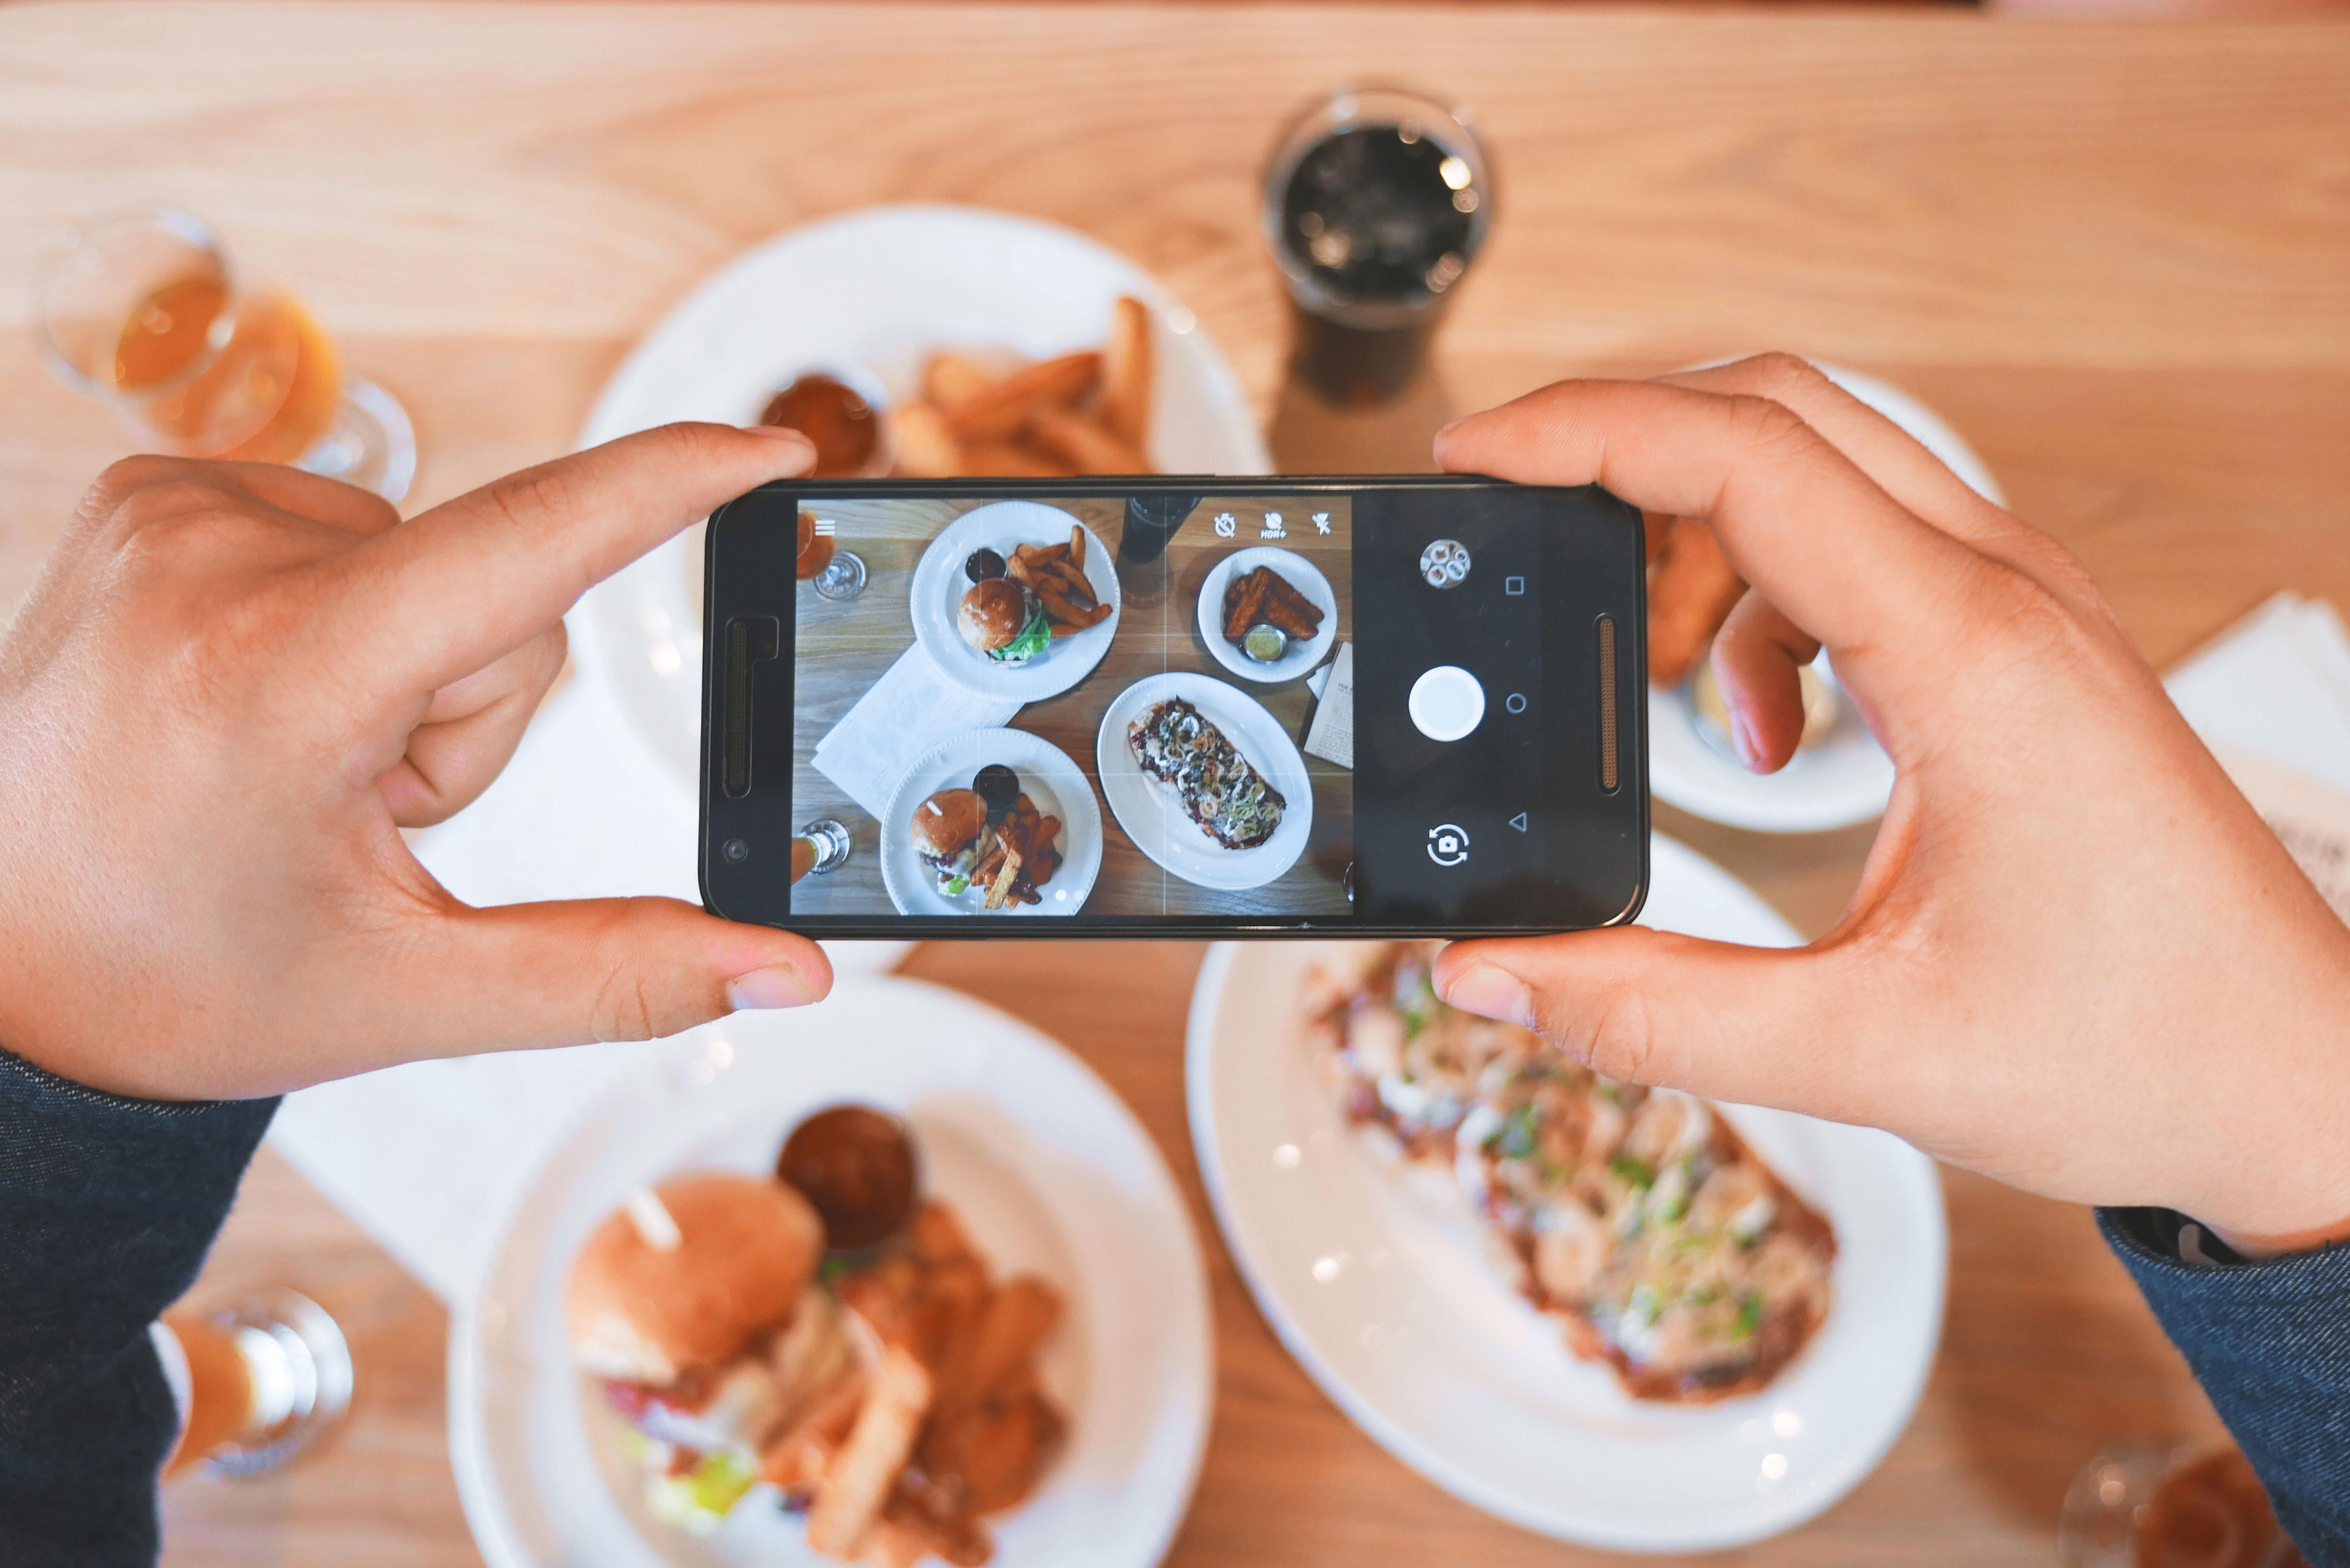 Hospitality Marketing - Instagram - Horeca - Restaurant, Café, Hotel - Tremento - Woman taking photo of food